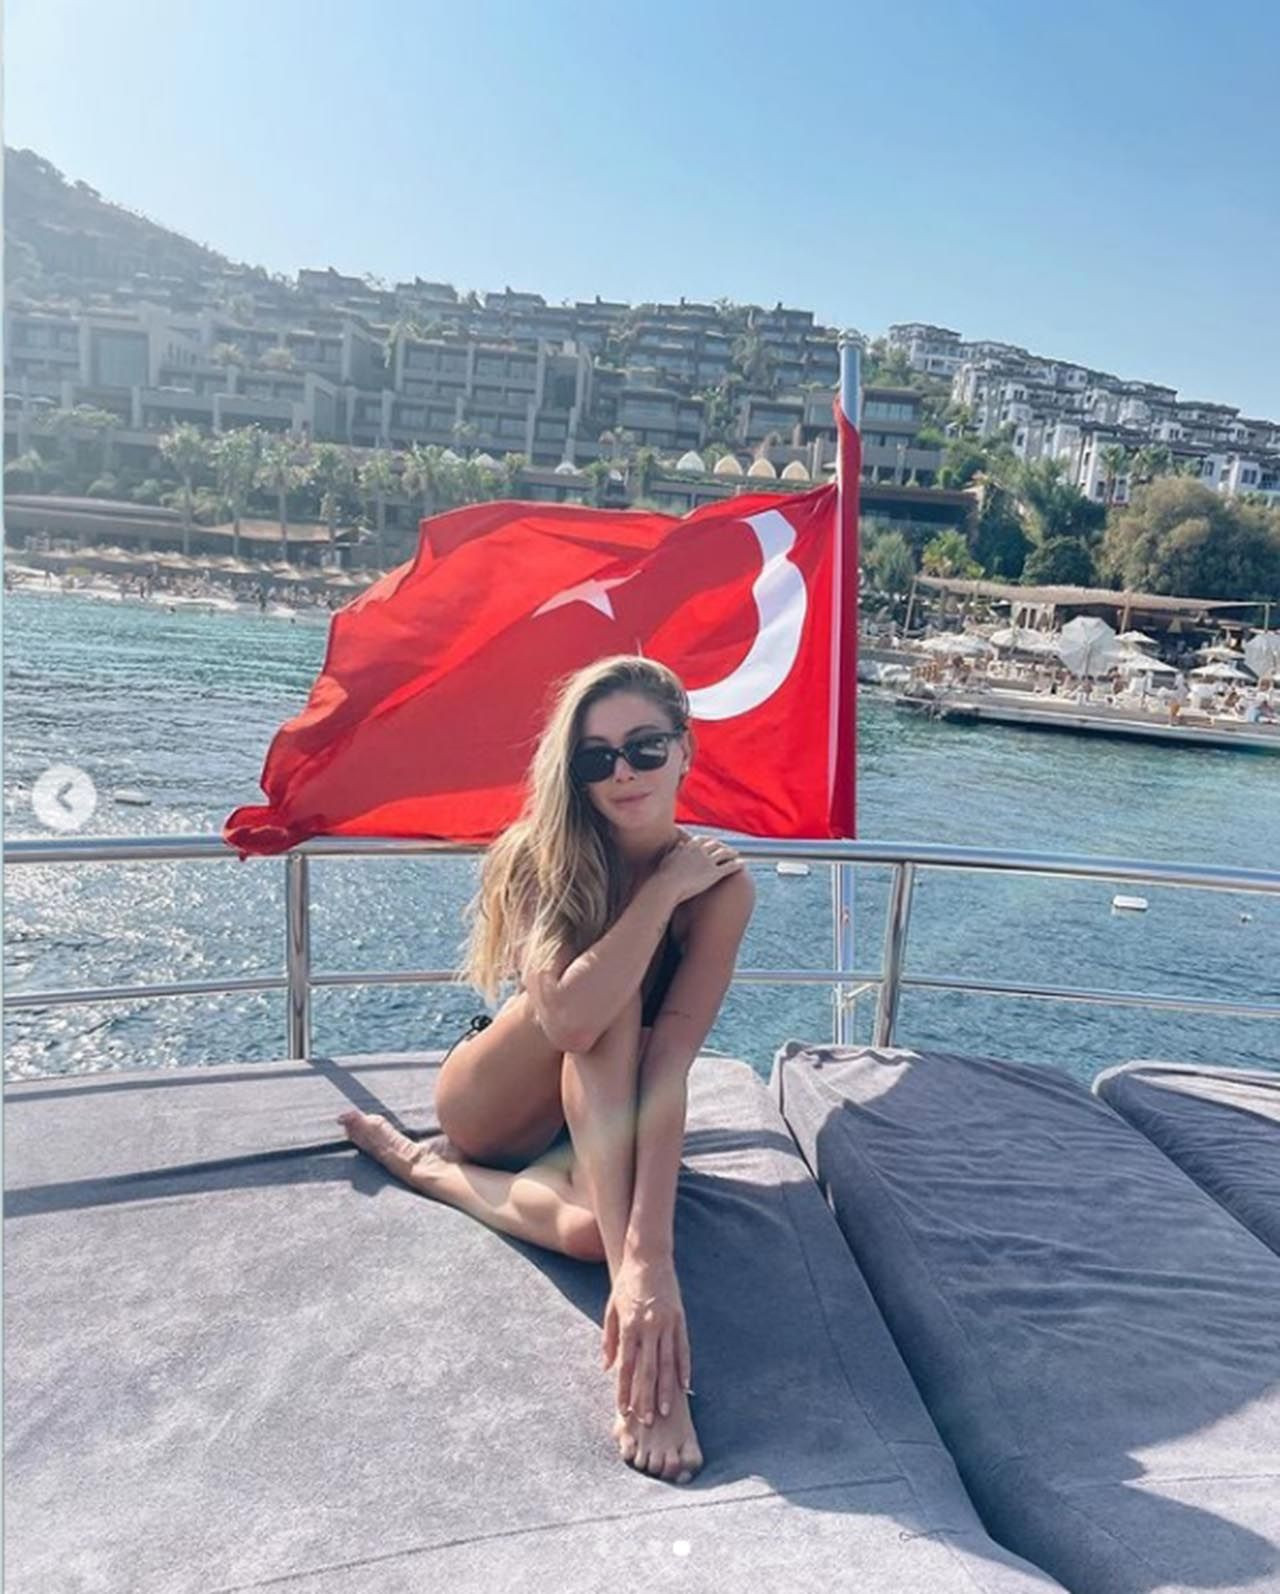 Bodrum'da tekne tatili yapan Şeyma Subaşı'nın savunması pes dedirtti! - Resim: 4